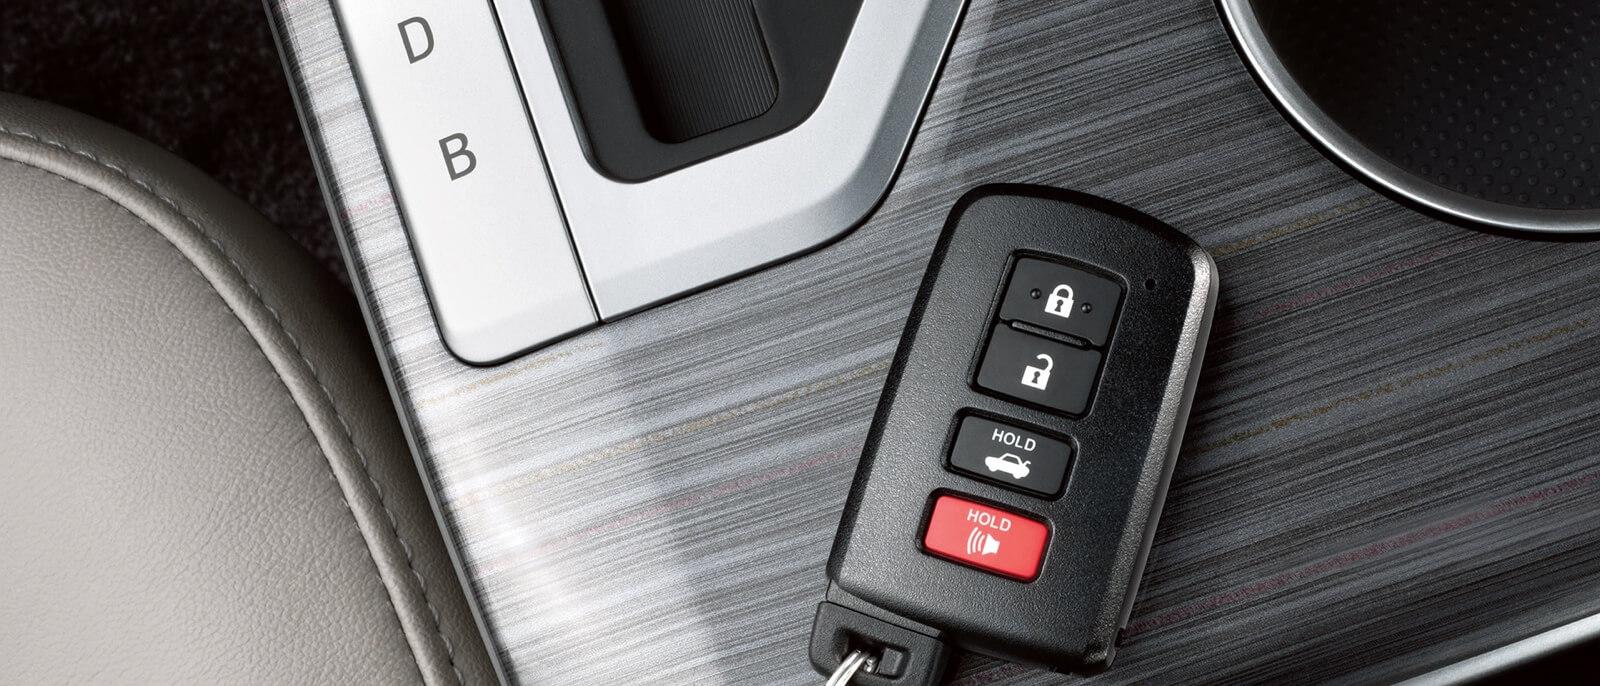 2015 Toyota Camry Key